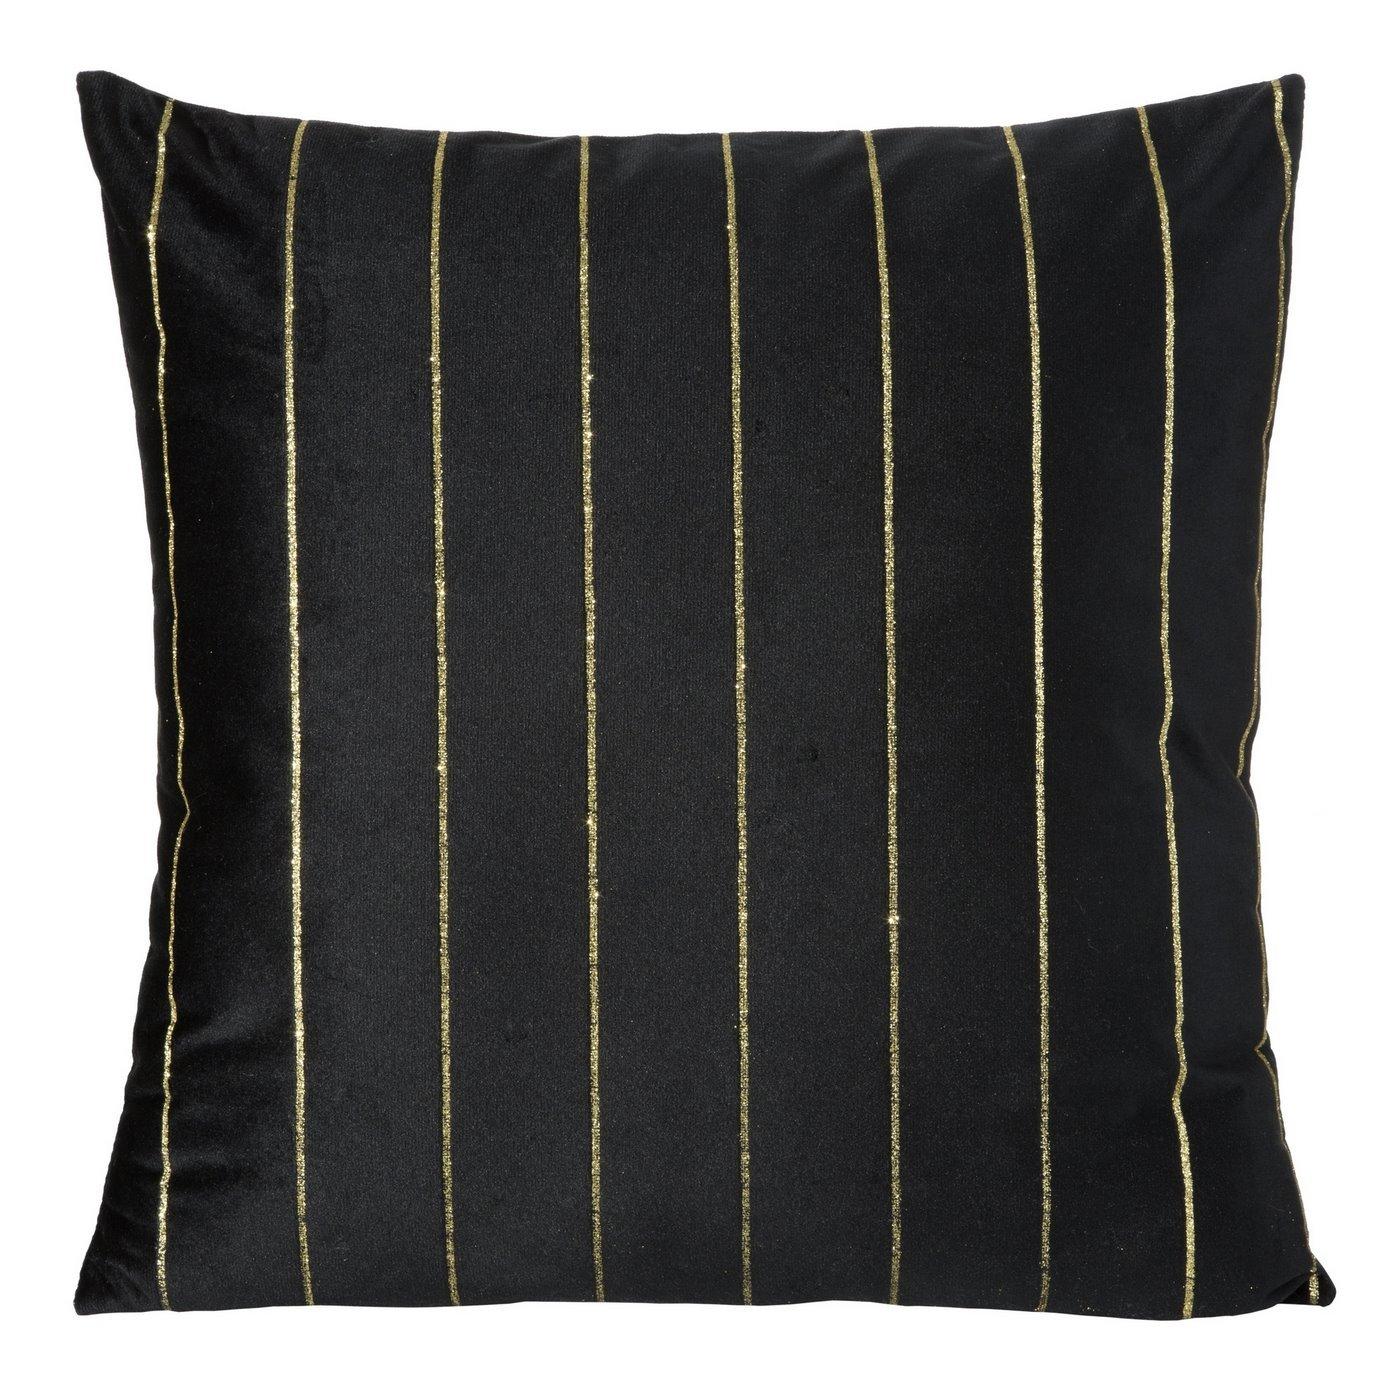 Poszewka dekoracyjna na poduszkę  45 x 45 Kolor Czarny